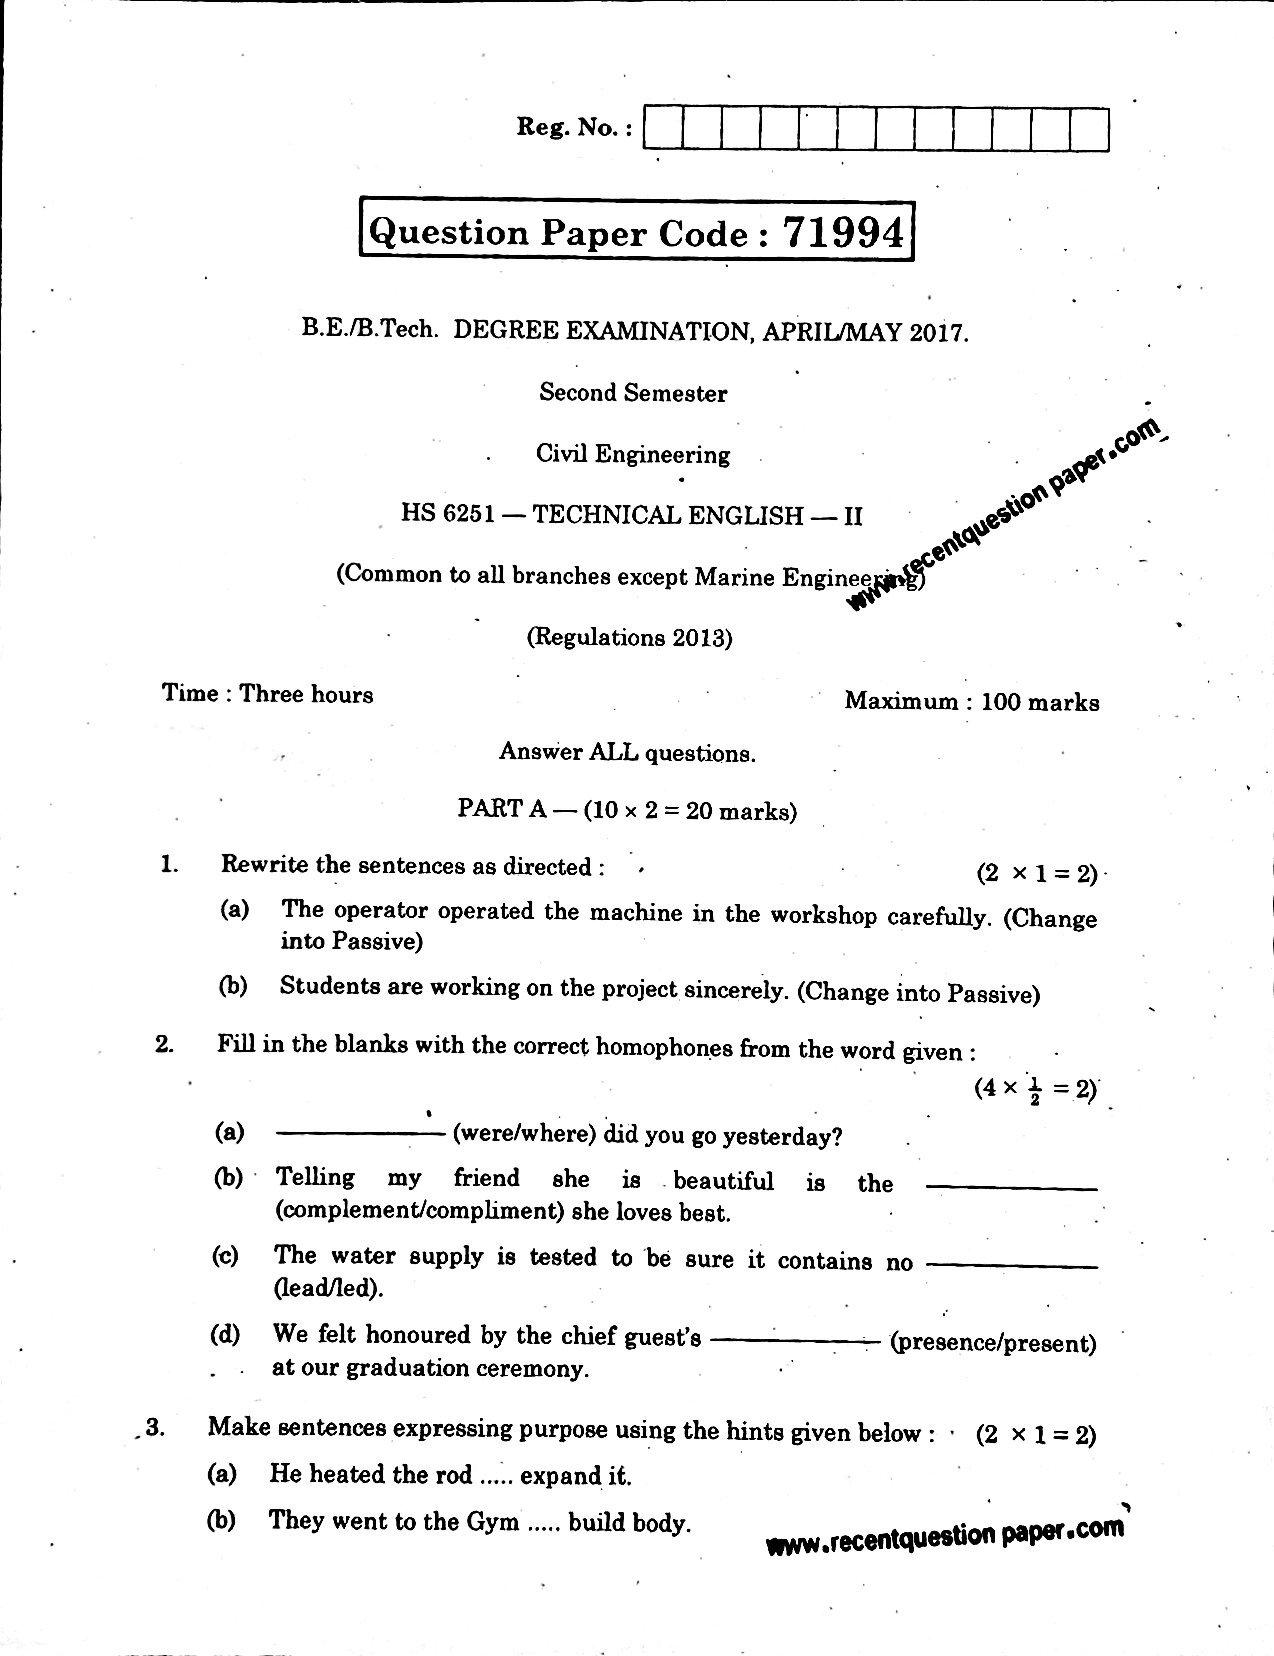 HS6251 Technical English-II April/May 2017 Anna University